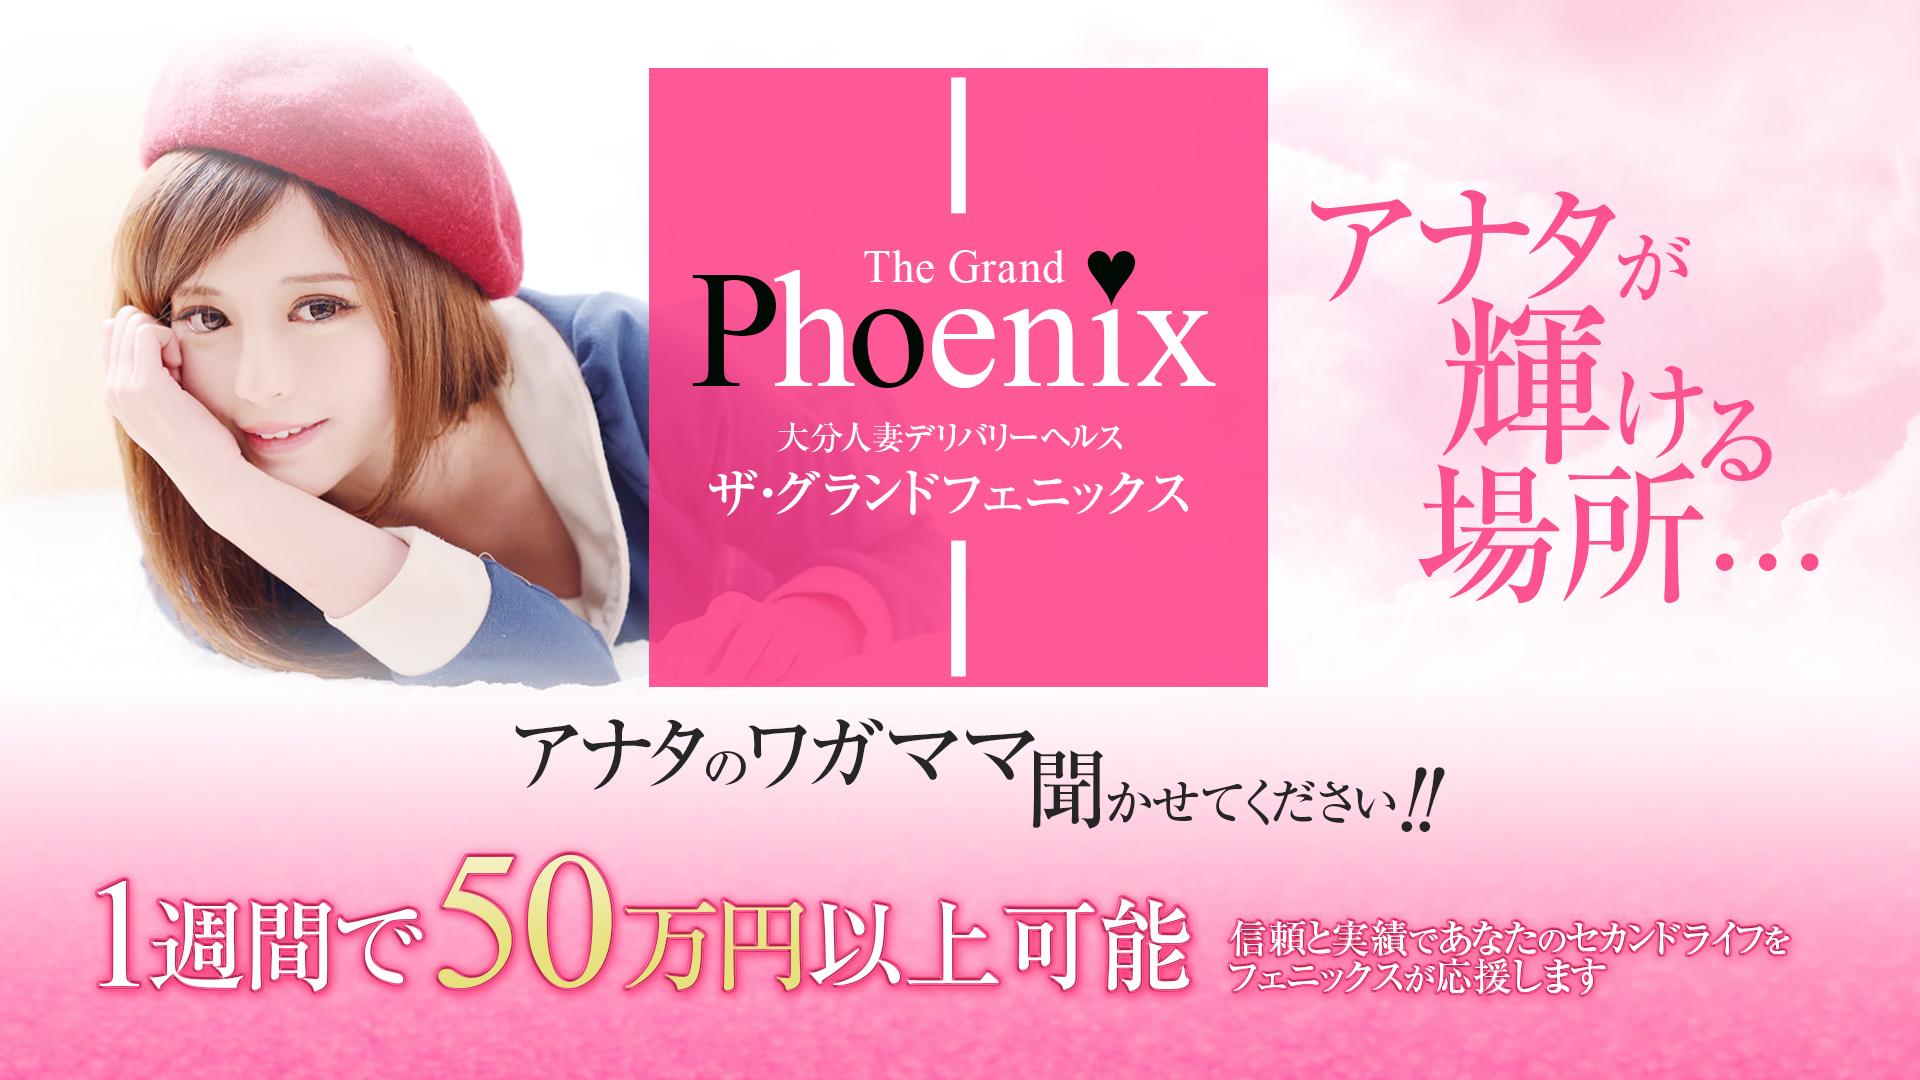 The Grand Phoenix